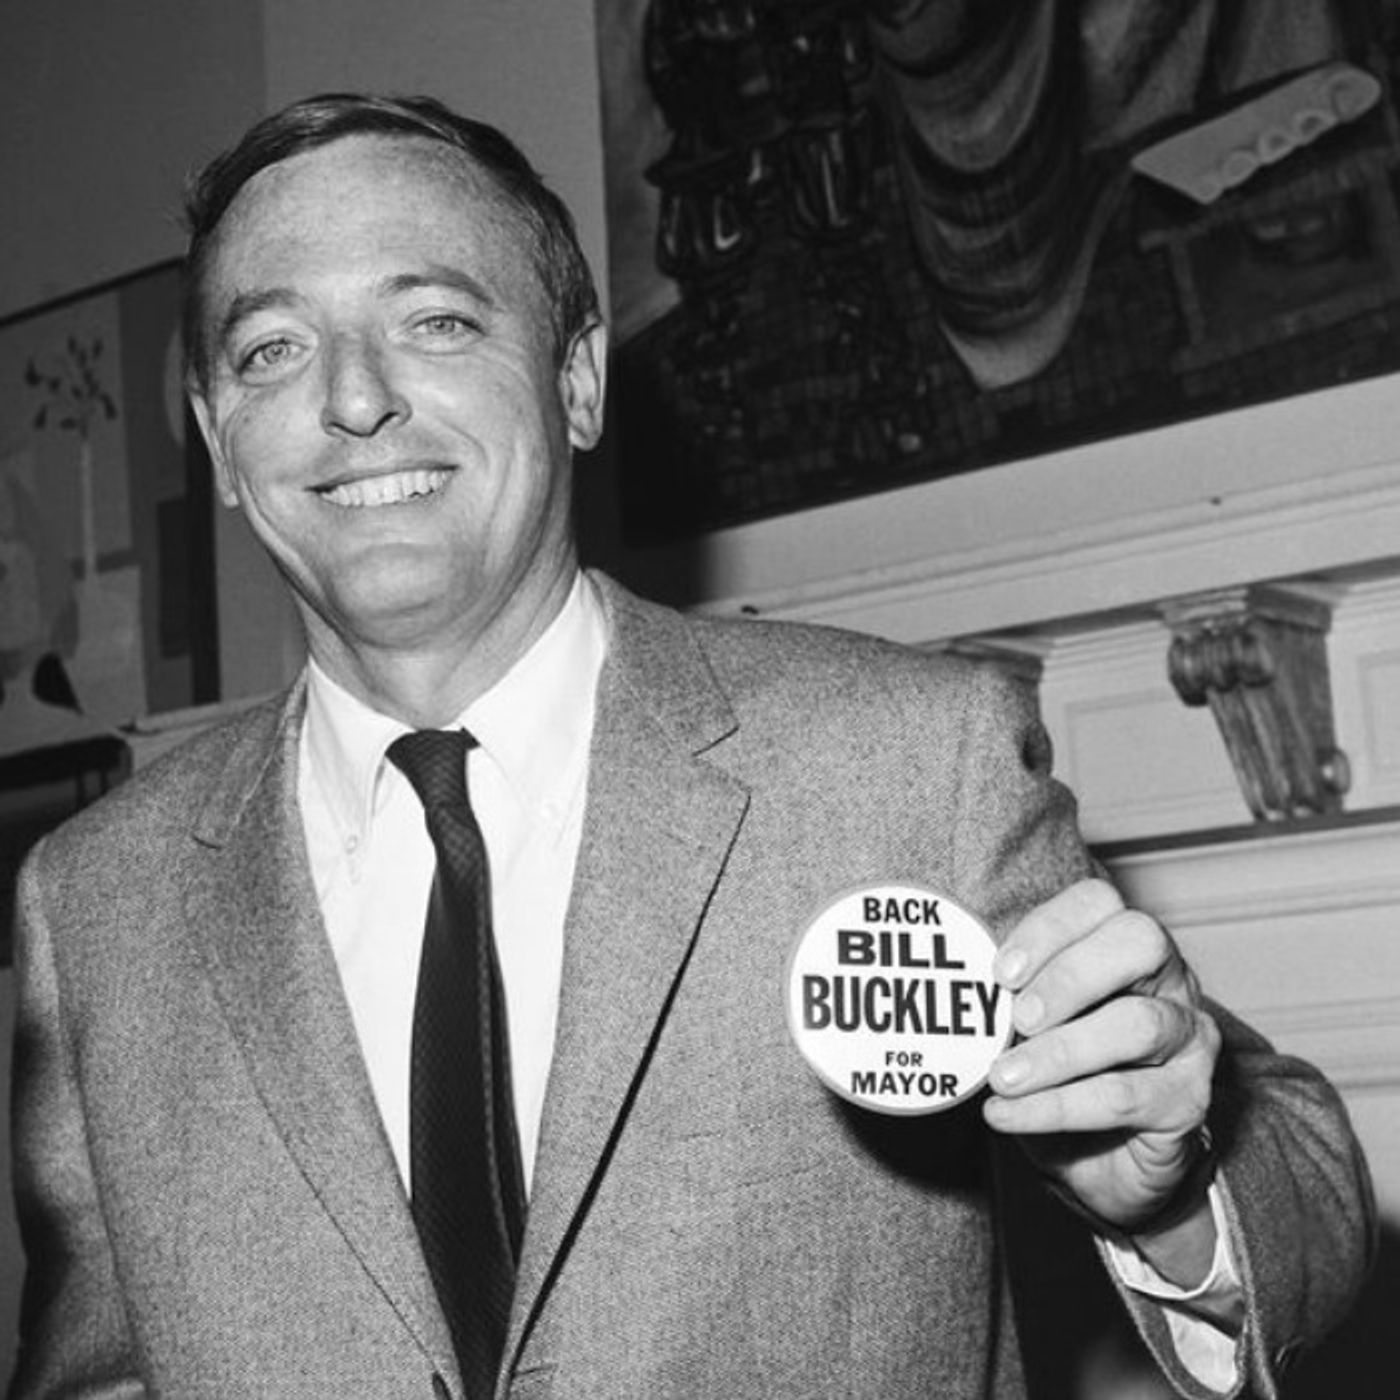 Buckley for Mayor (w/ Sam Tanenhaus)